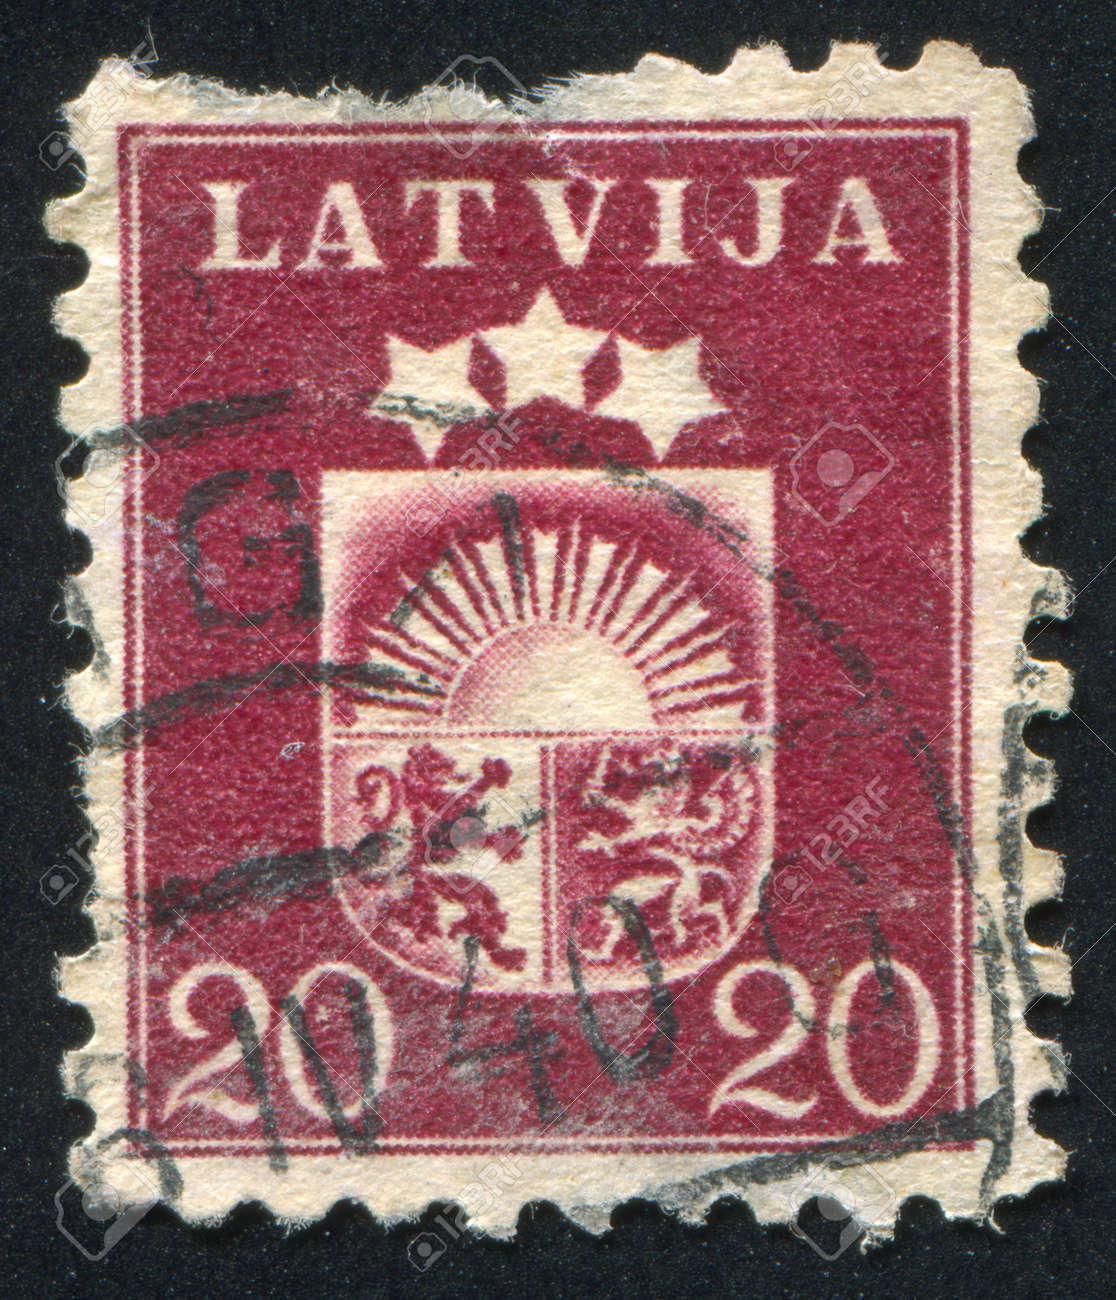 LATVIA - CIRCA 1919: stamp printed by Latvia, shows Arms, circa 1919 Stock Photo - 20527516